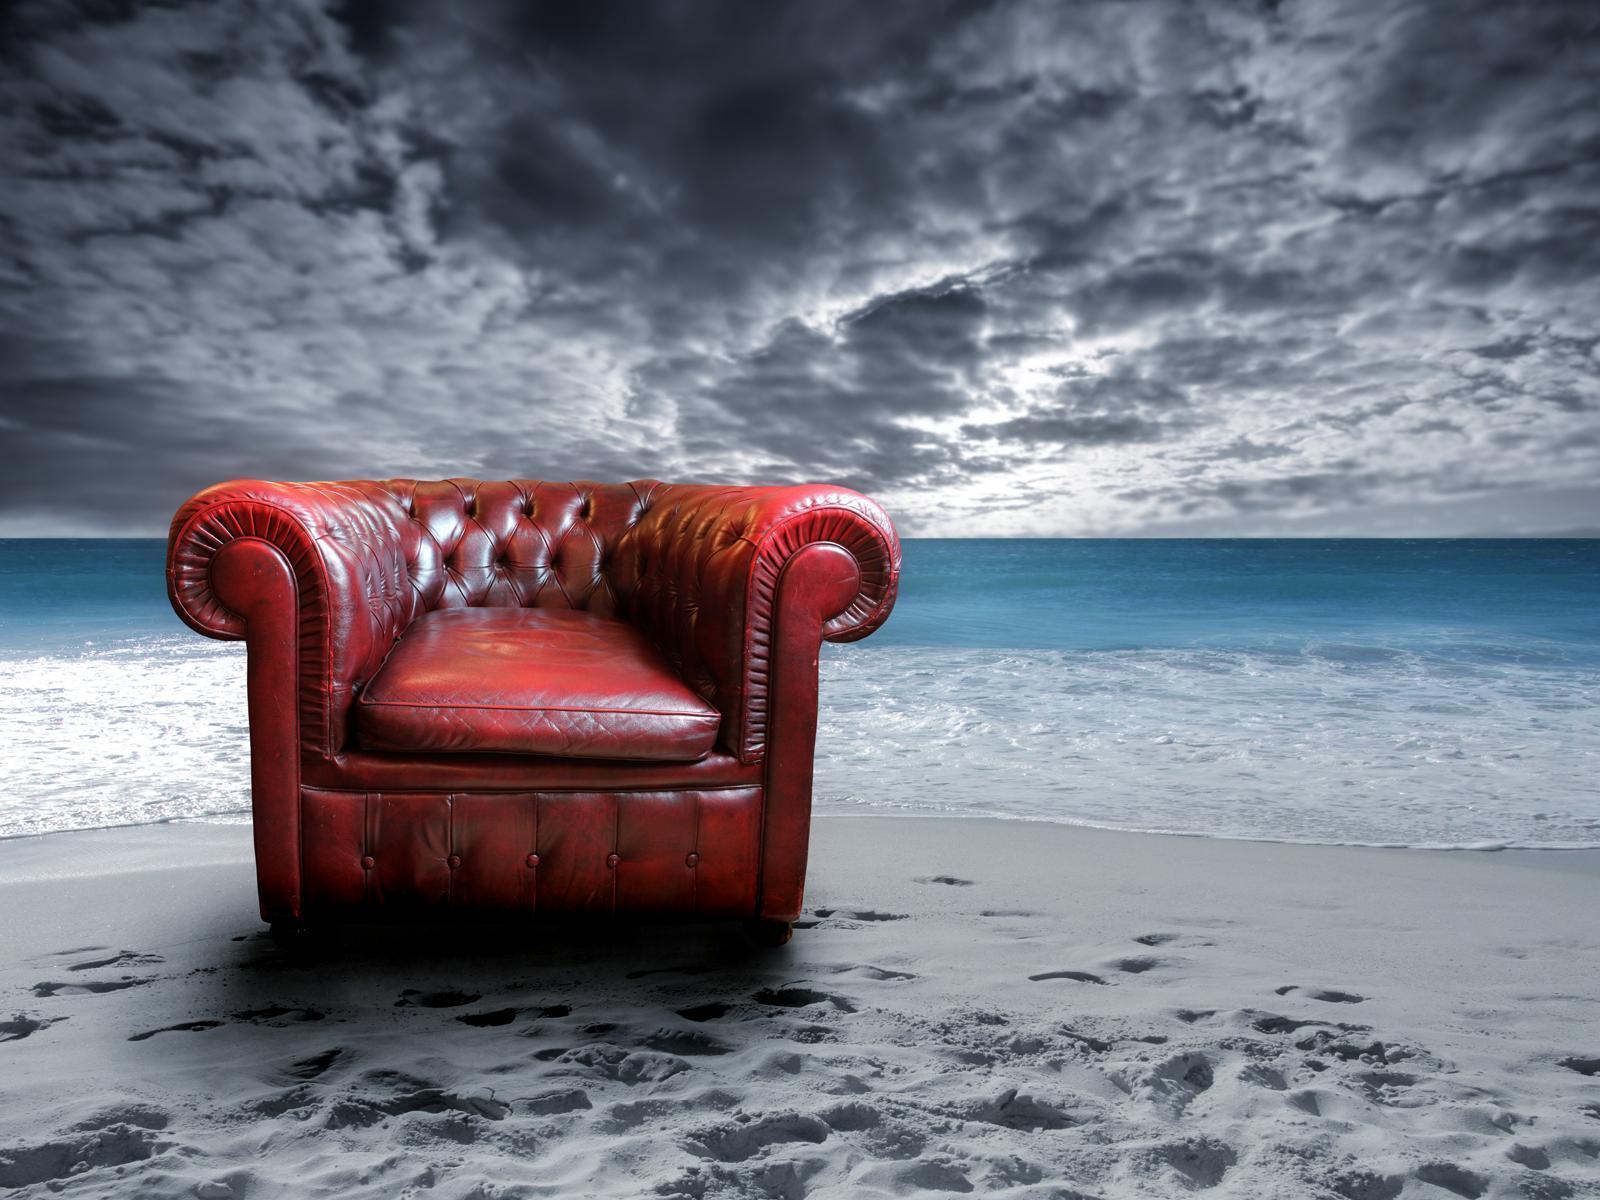 Beach Chair Wallpapers - Wallpaper Cave